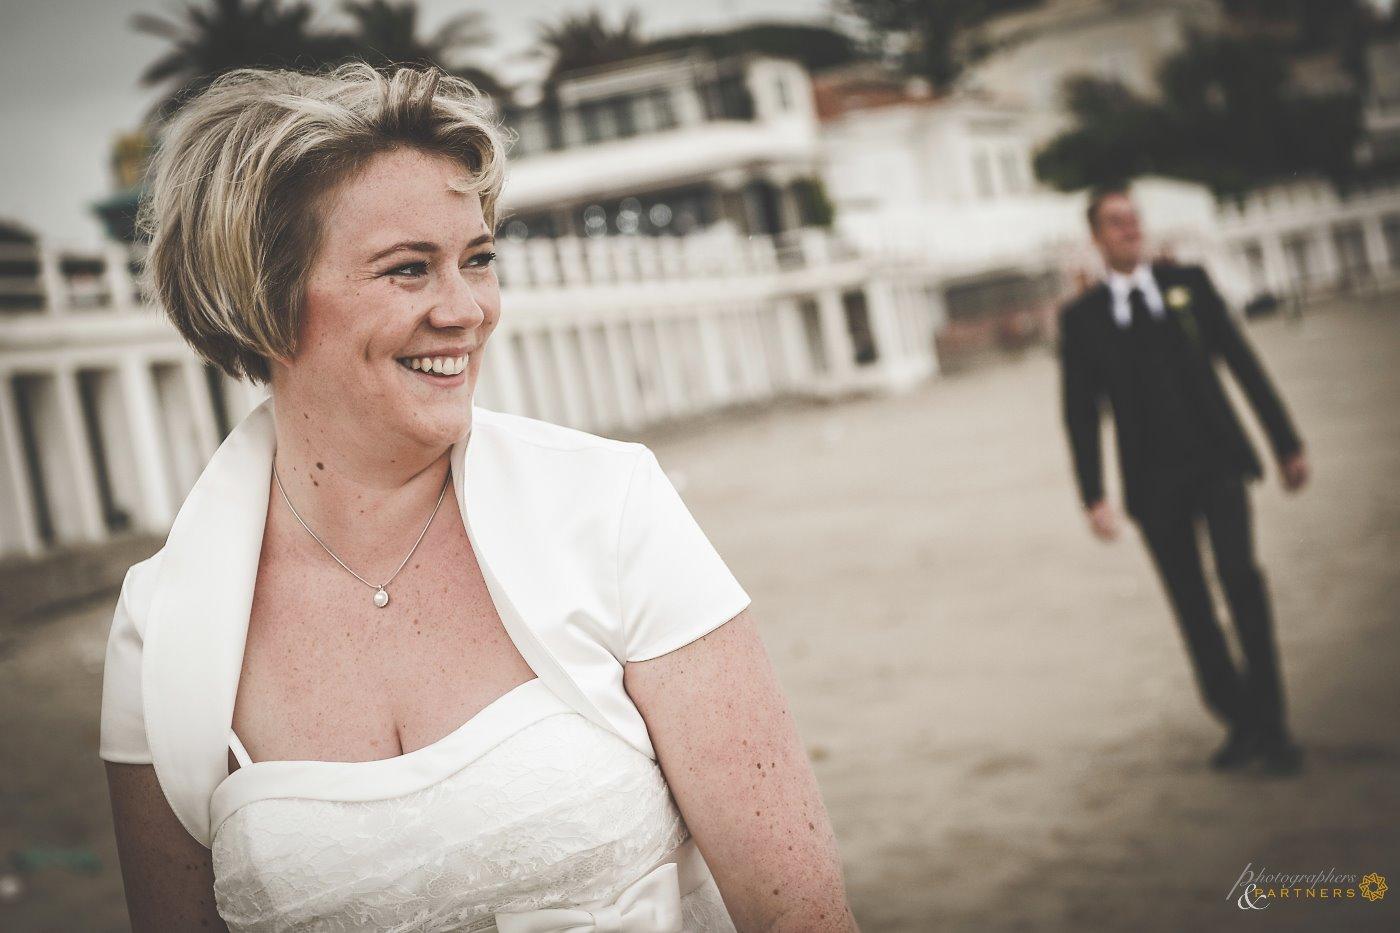 photographer_wedding_santa_marinella_17.jpg